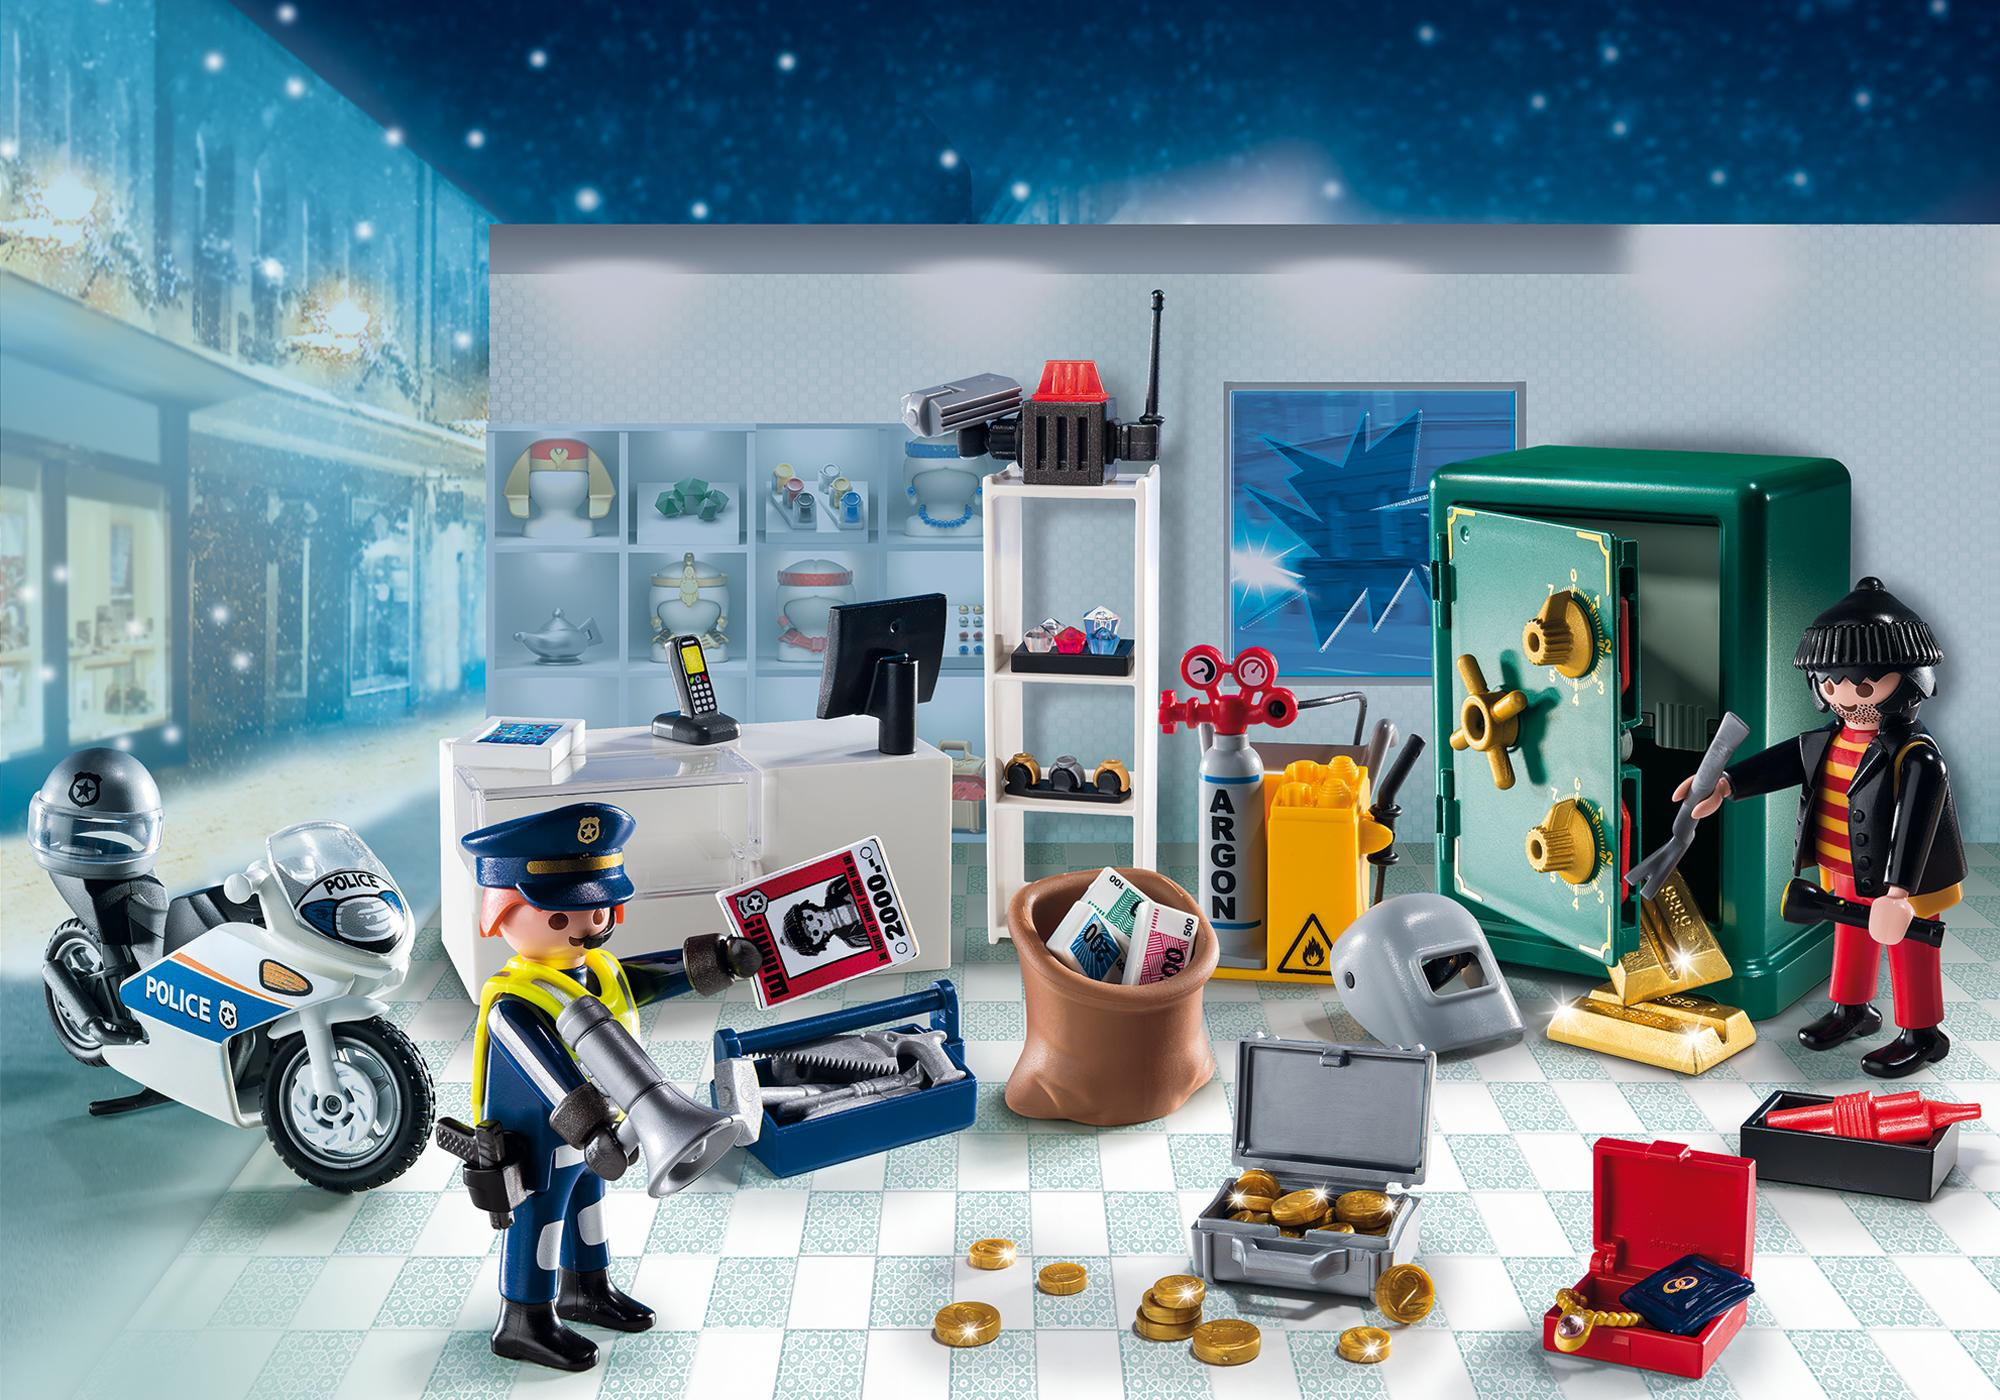 http://media.playmobil.com/i/playmobil/9007_product_extra1/Calendario de Navidad - Robo en la Joyería